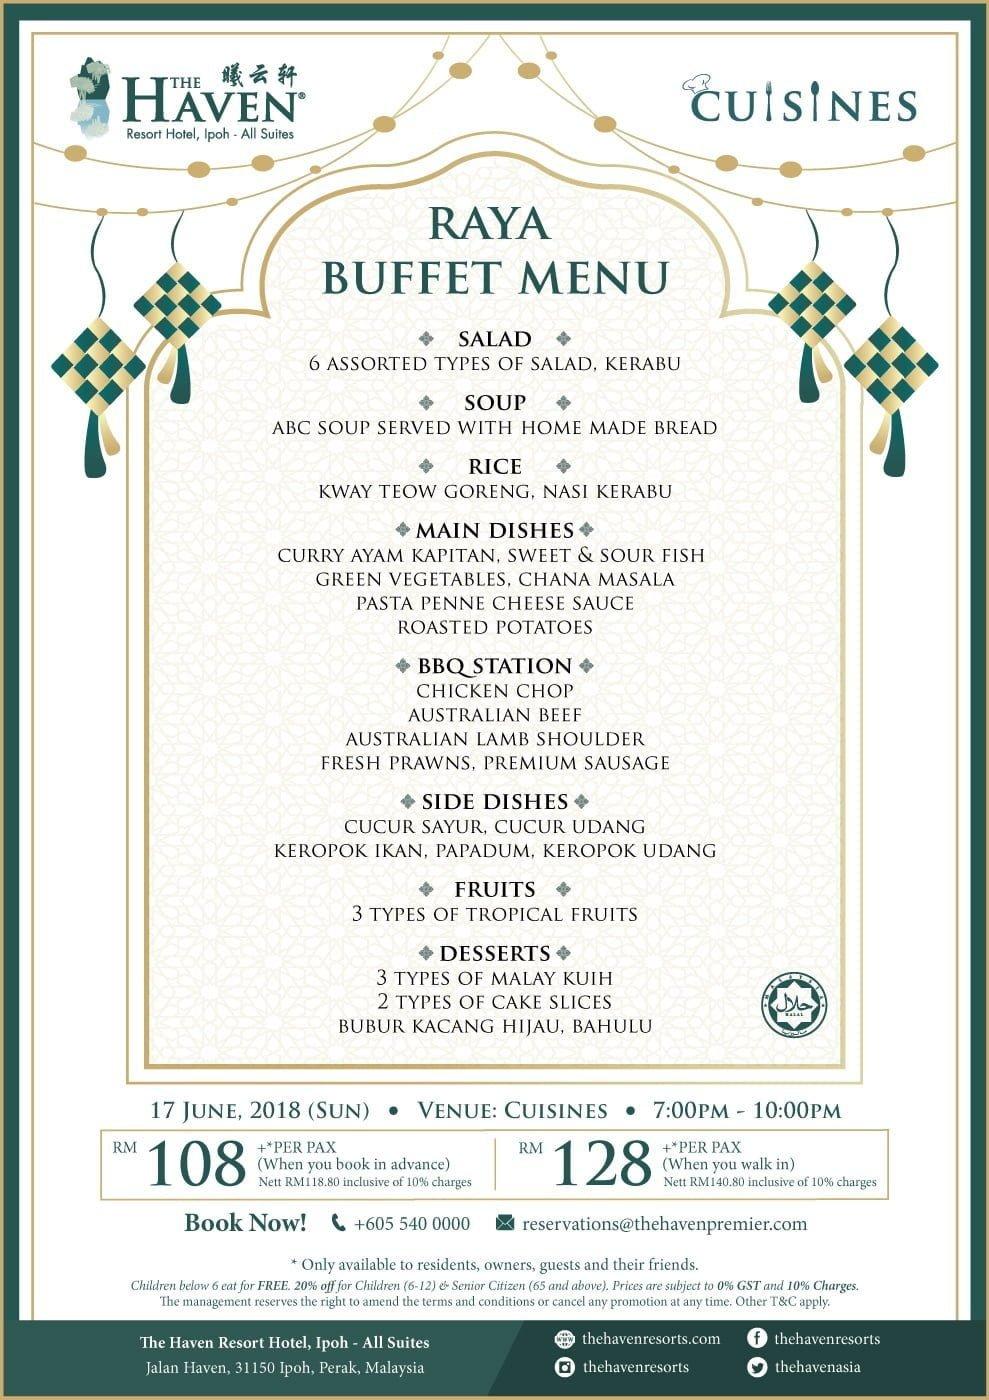 menu for Sunday, 17th June, 2018